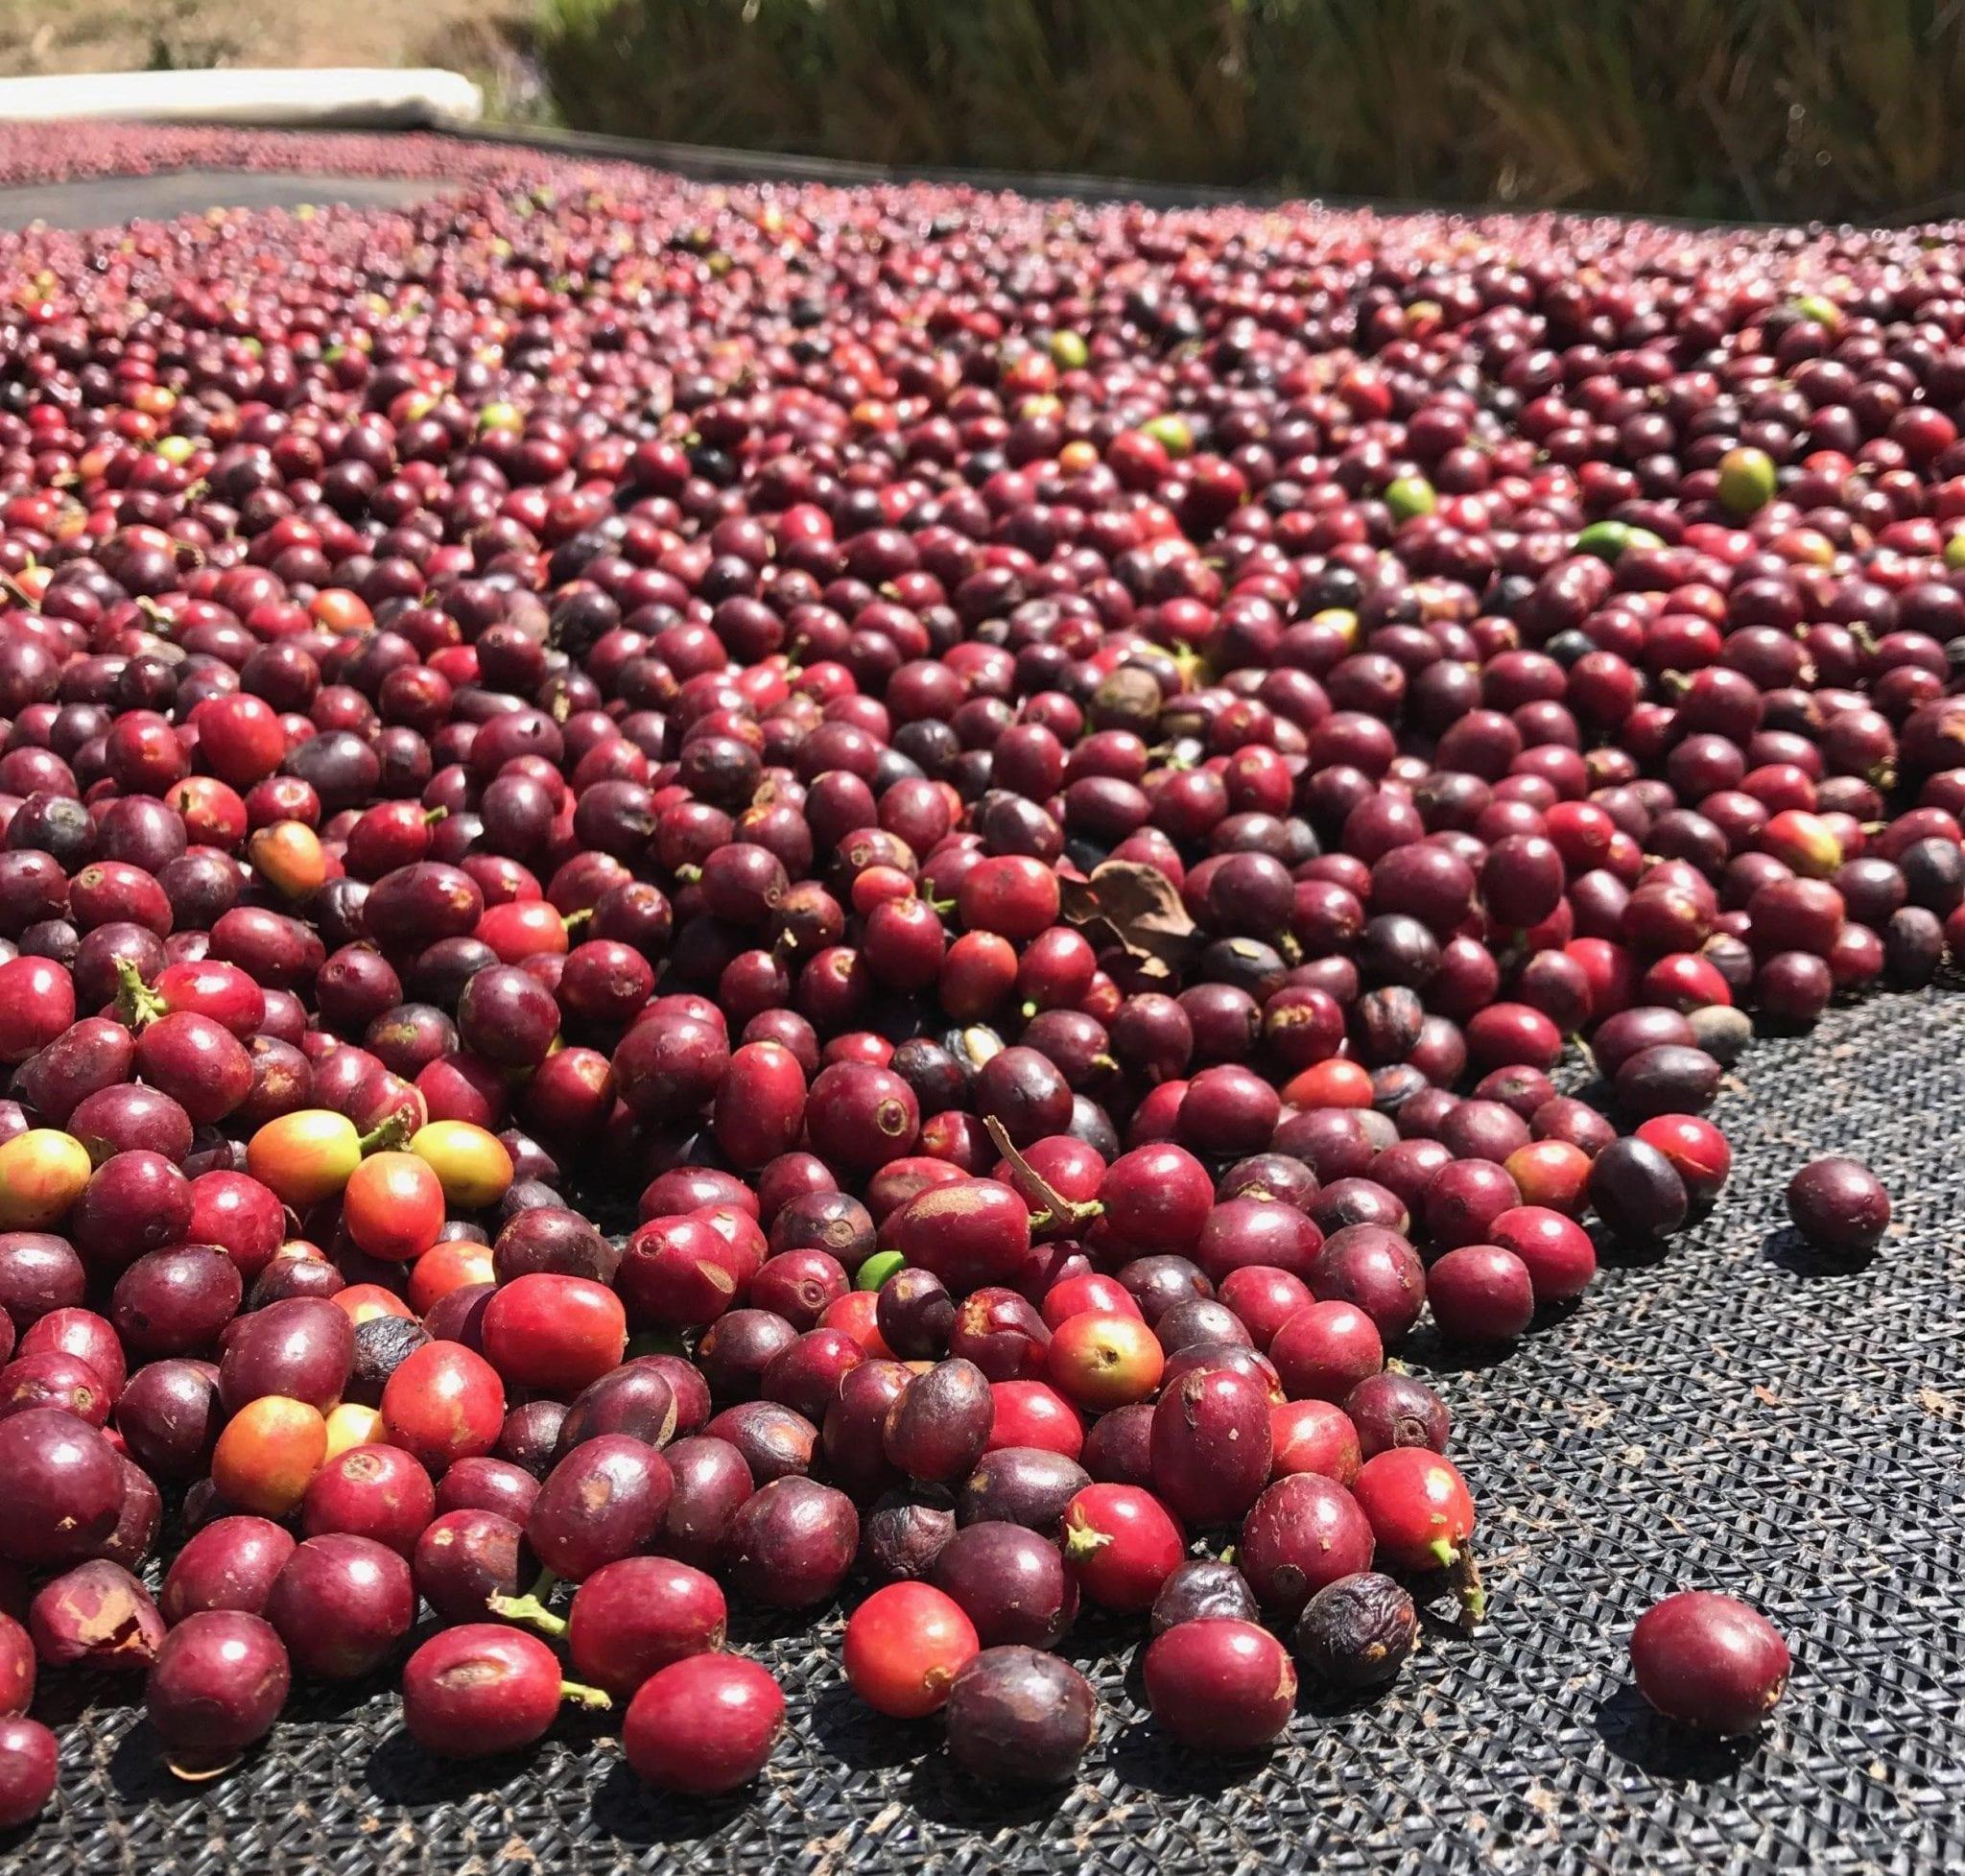 Ripe-red coffee